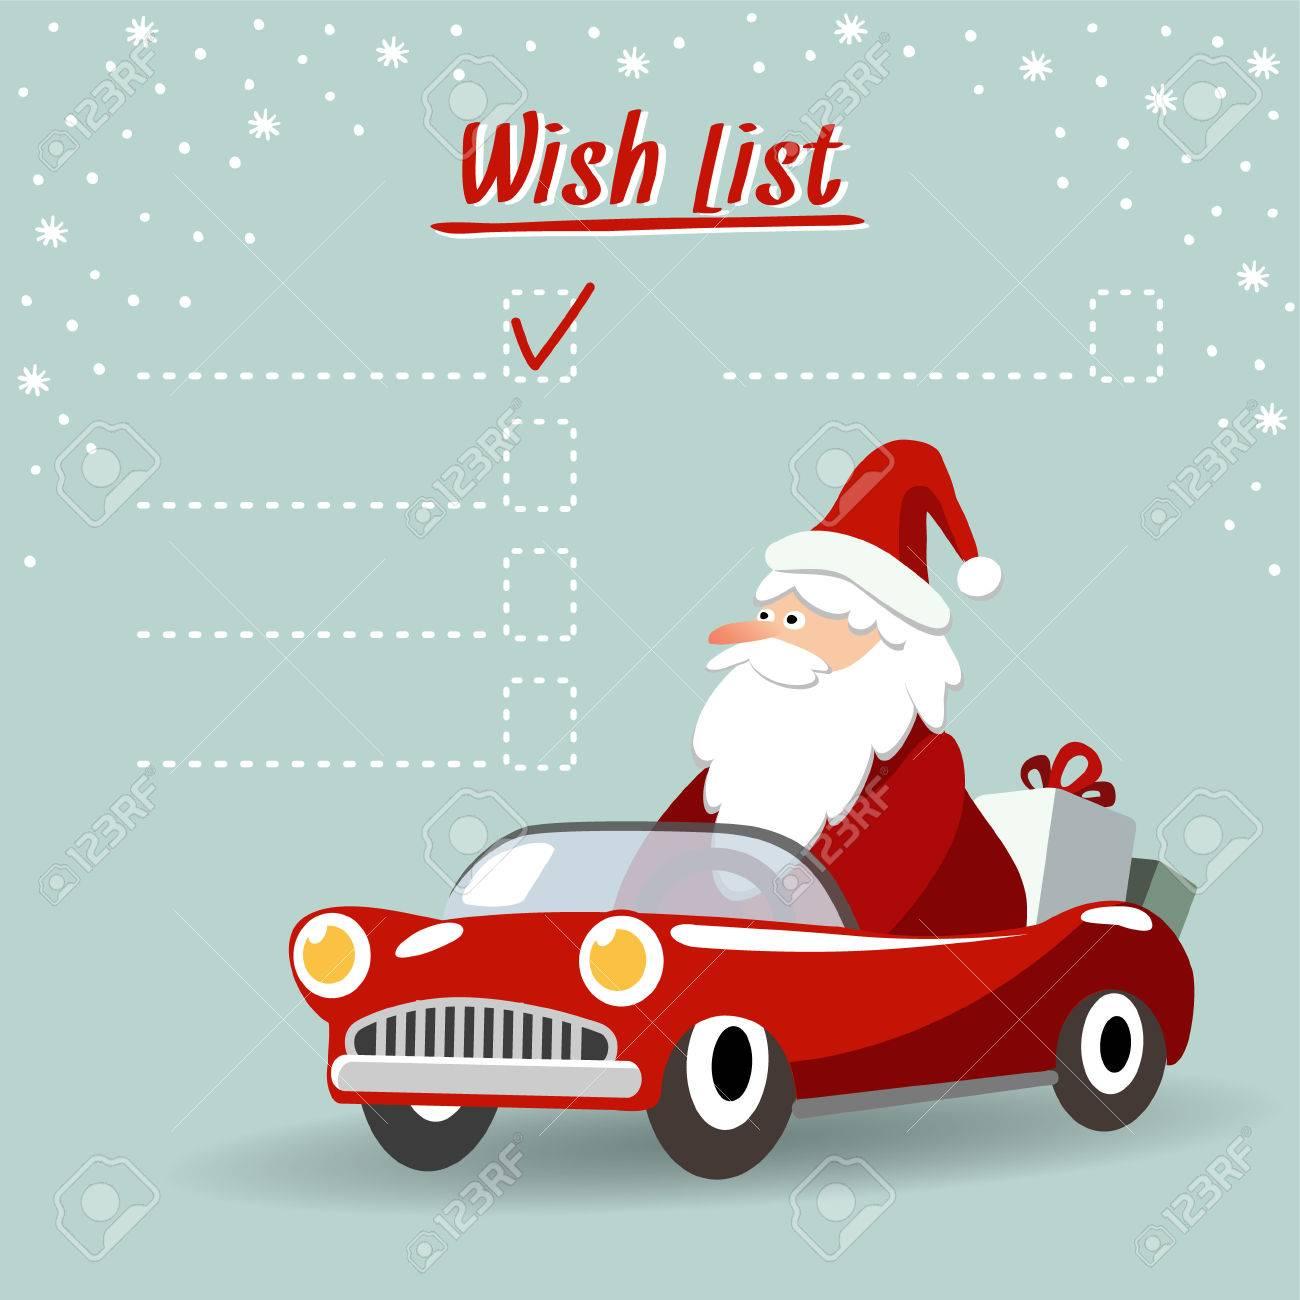 Cute Christmas Greeting Card Wish List With Santa Claus Retro – Santa Wish List Online